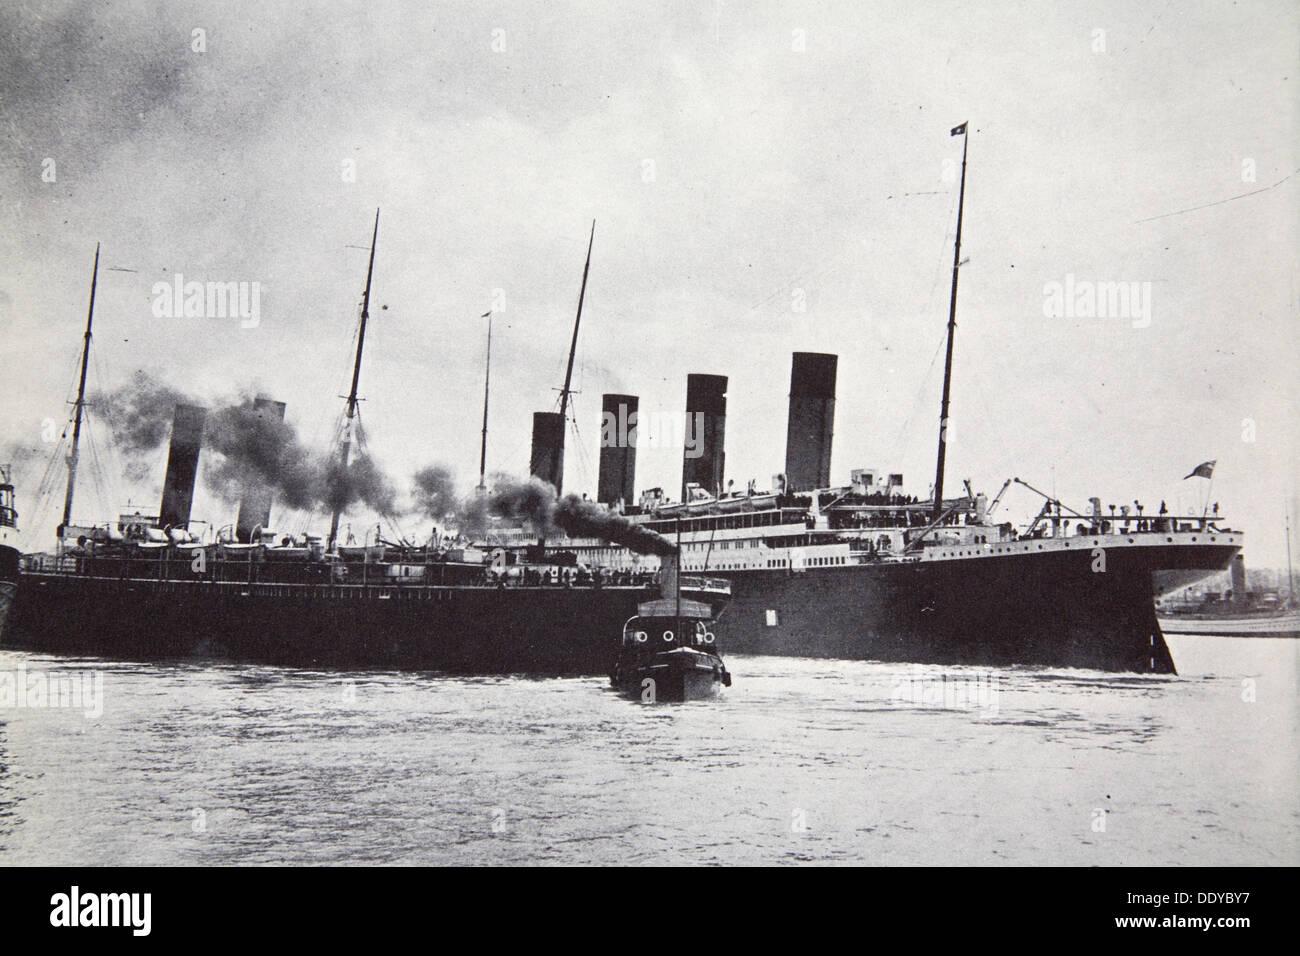 The RMS 'Titanic' leaving Southampton, 10 April 1912. Artist: Unknown - Stock Image